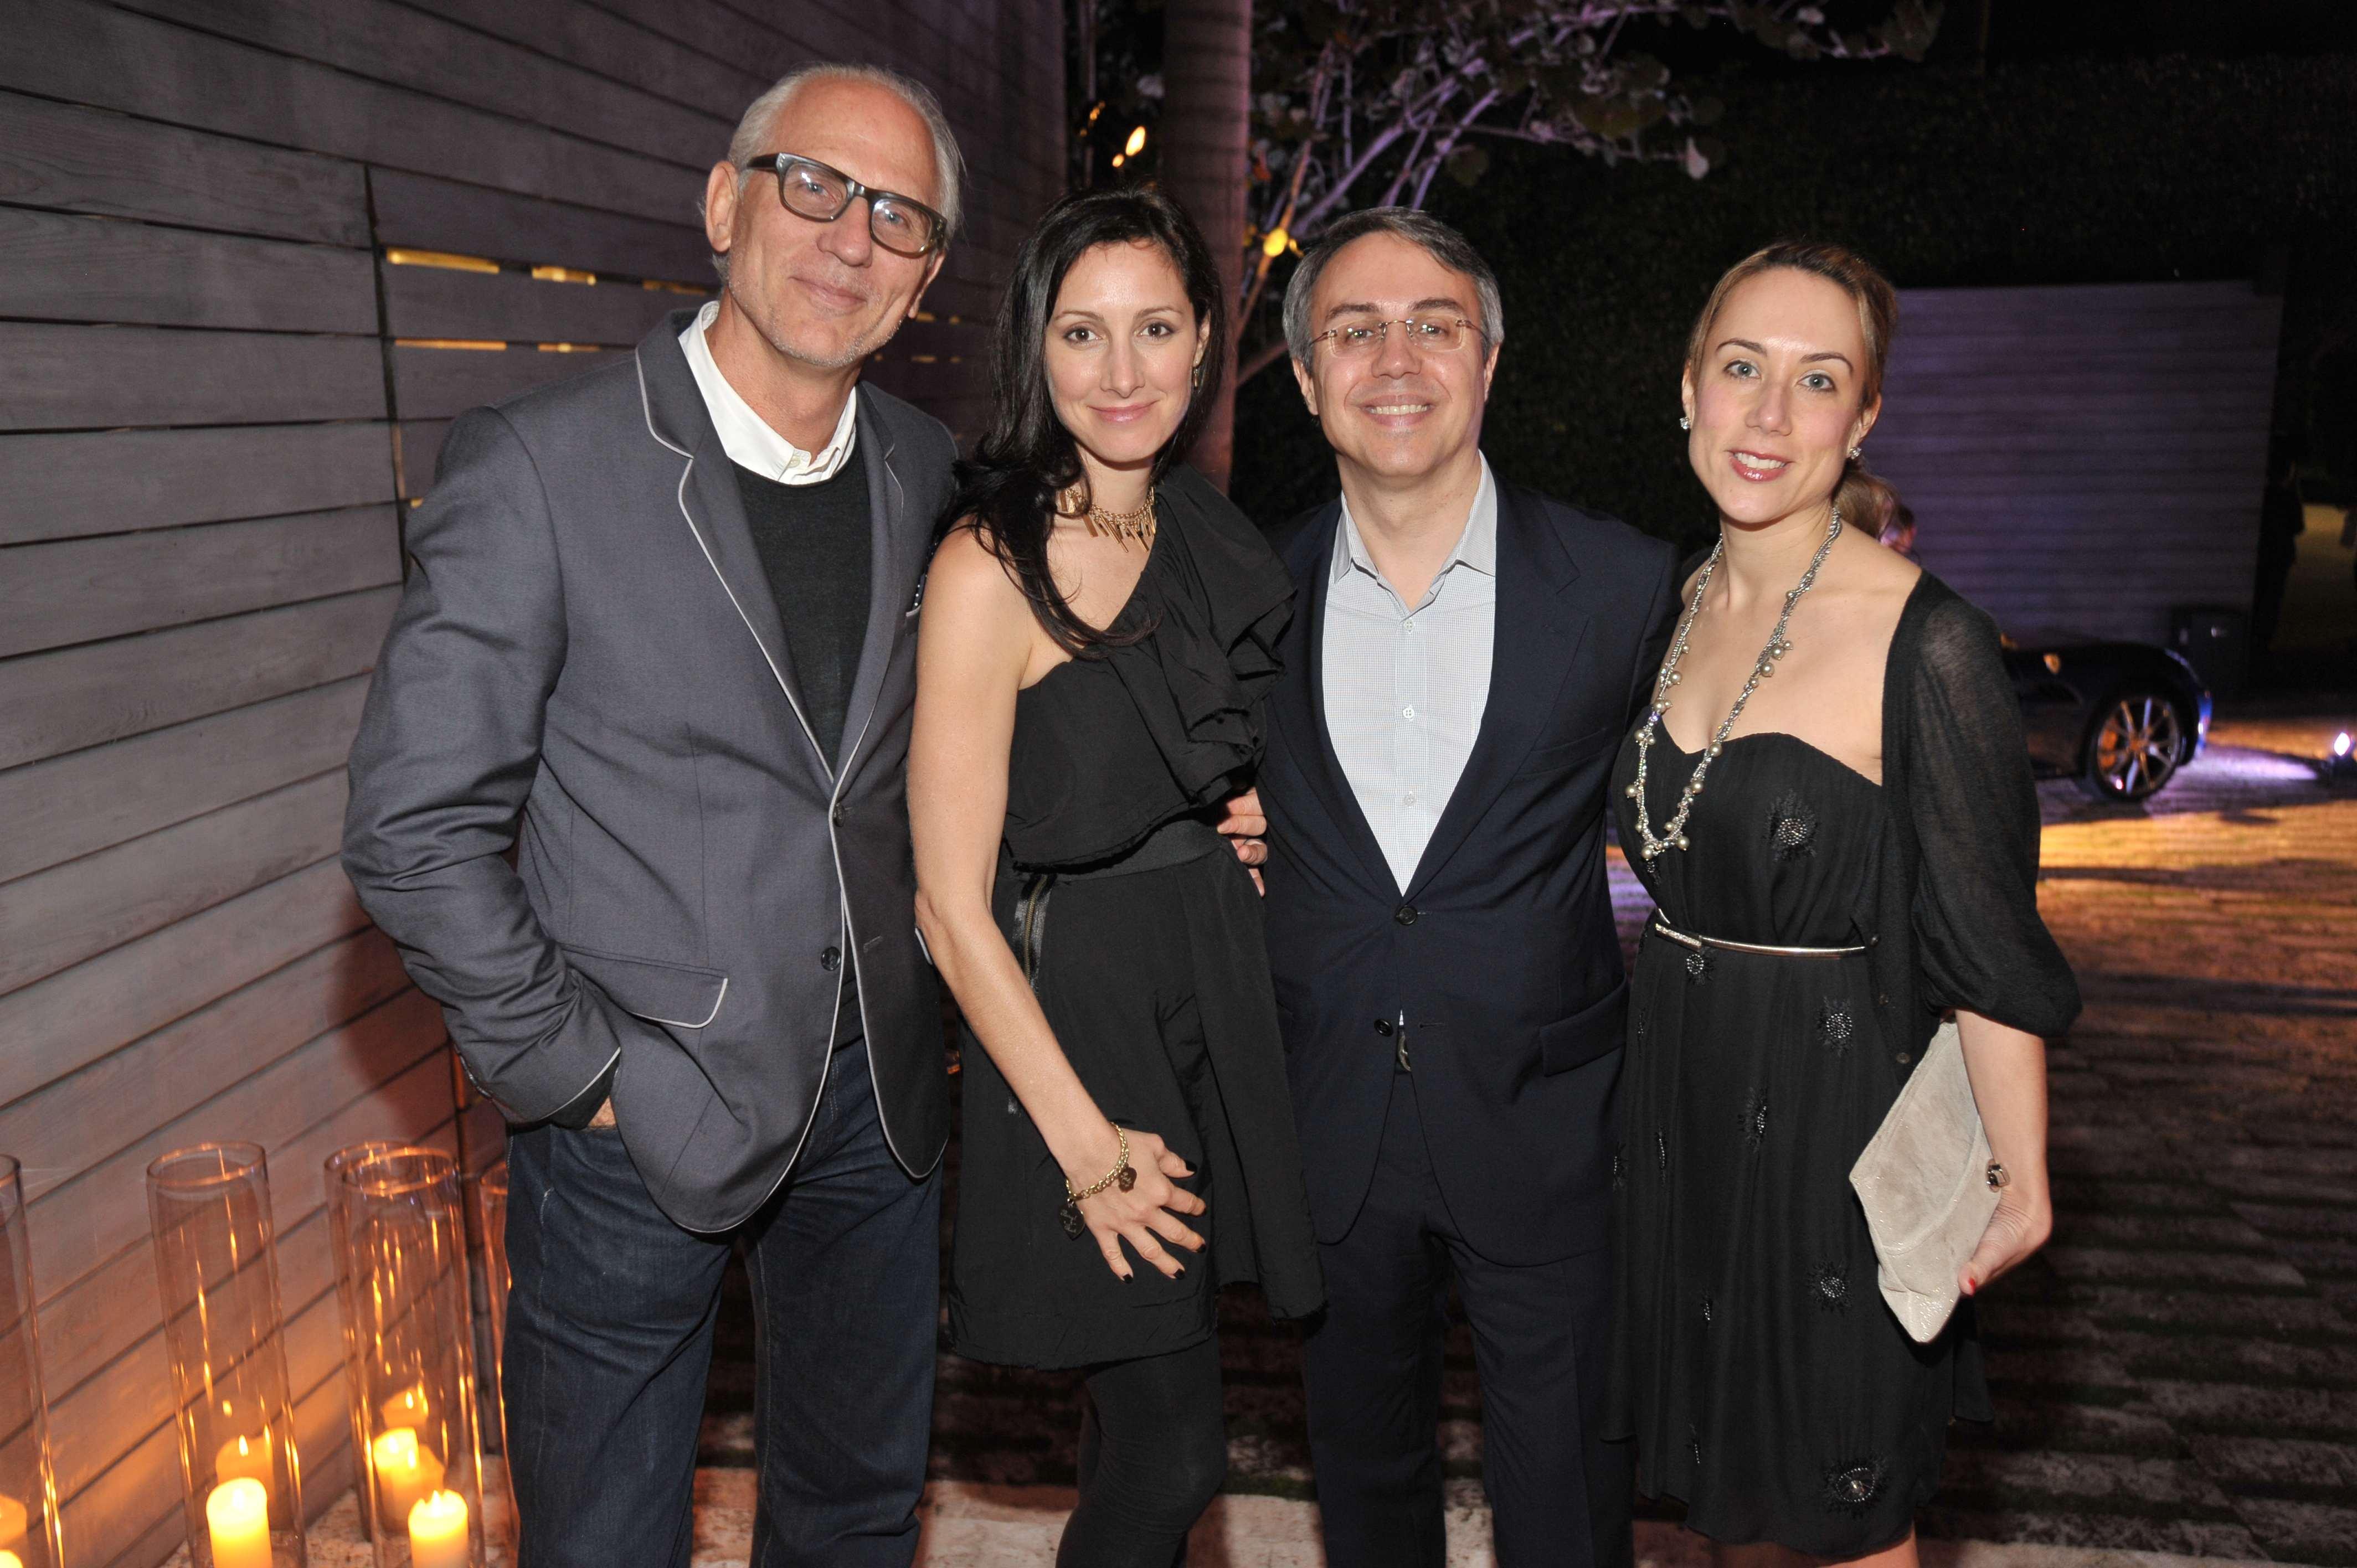 Richard Frazier & Laura Kirar & Stephan pepe & Sabrina Rodriguez1